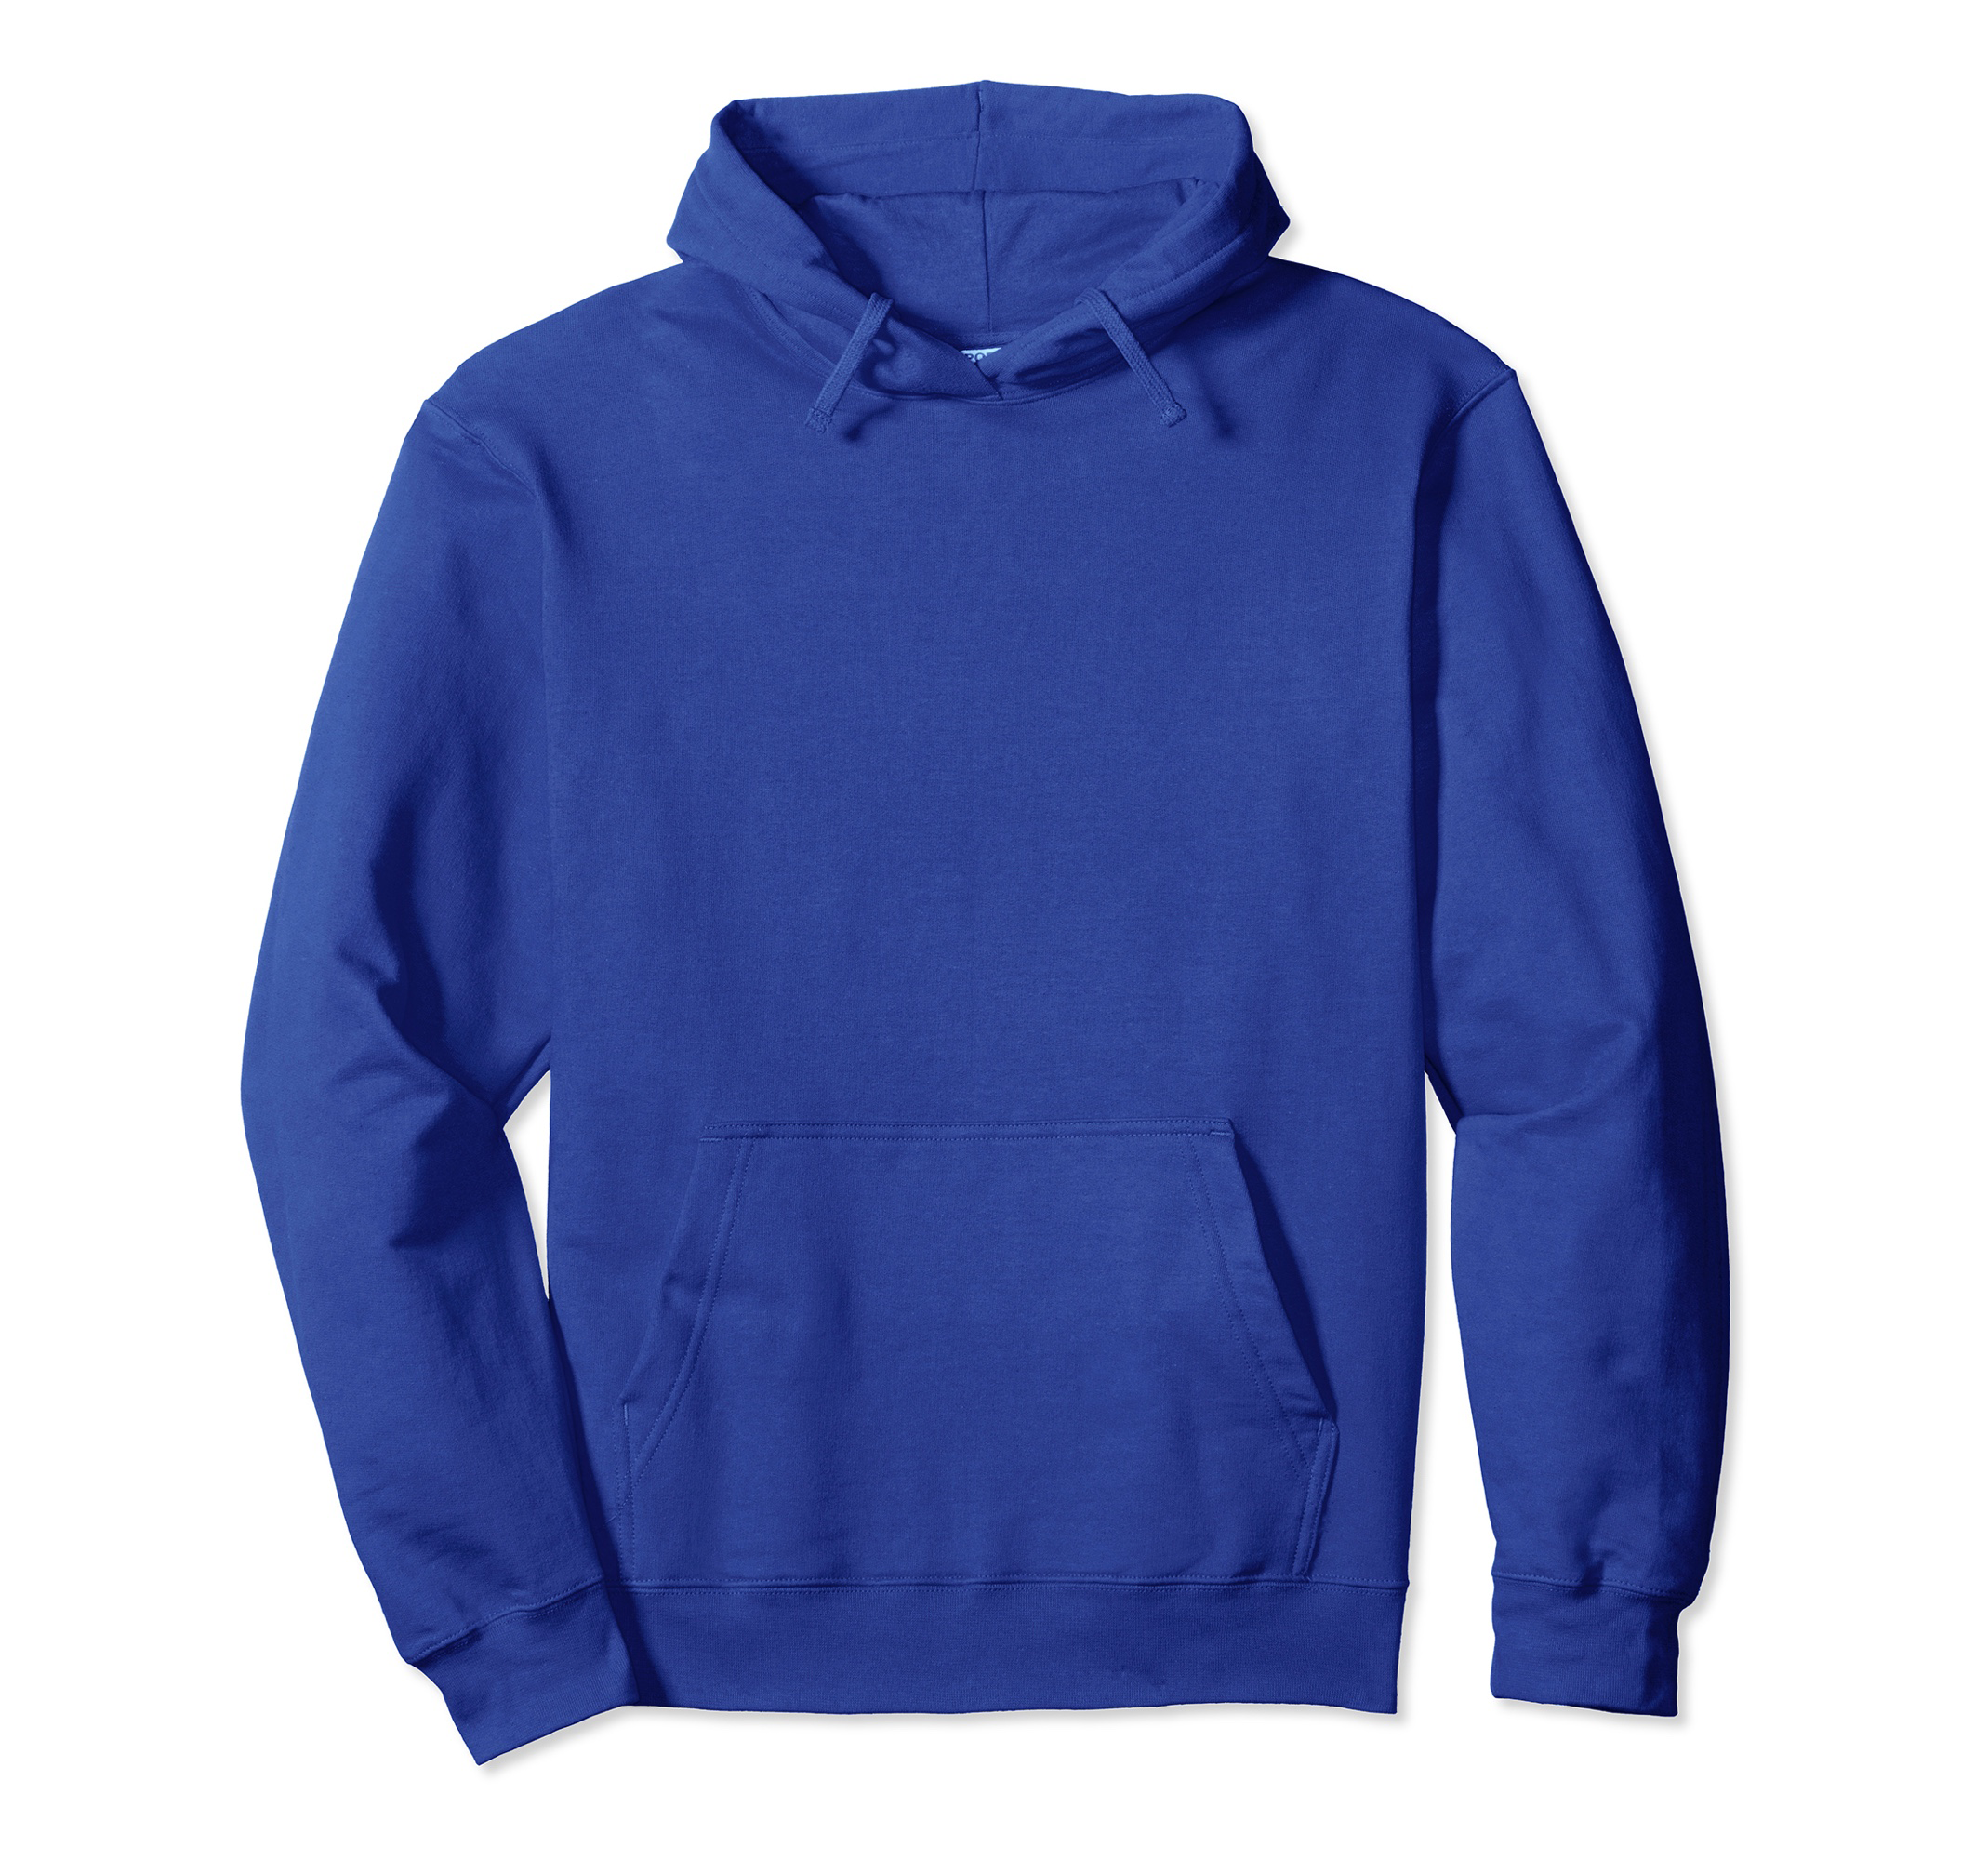 2nd amendment rights hoodie sweatshirt gun owner gun rights men/'s sweater